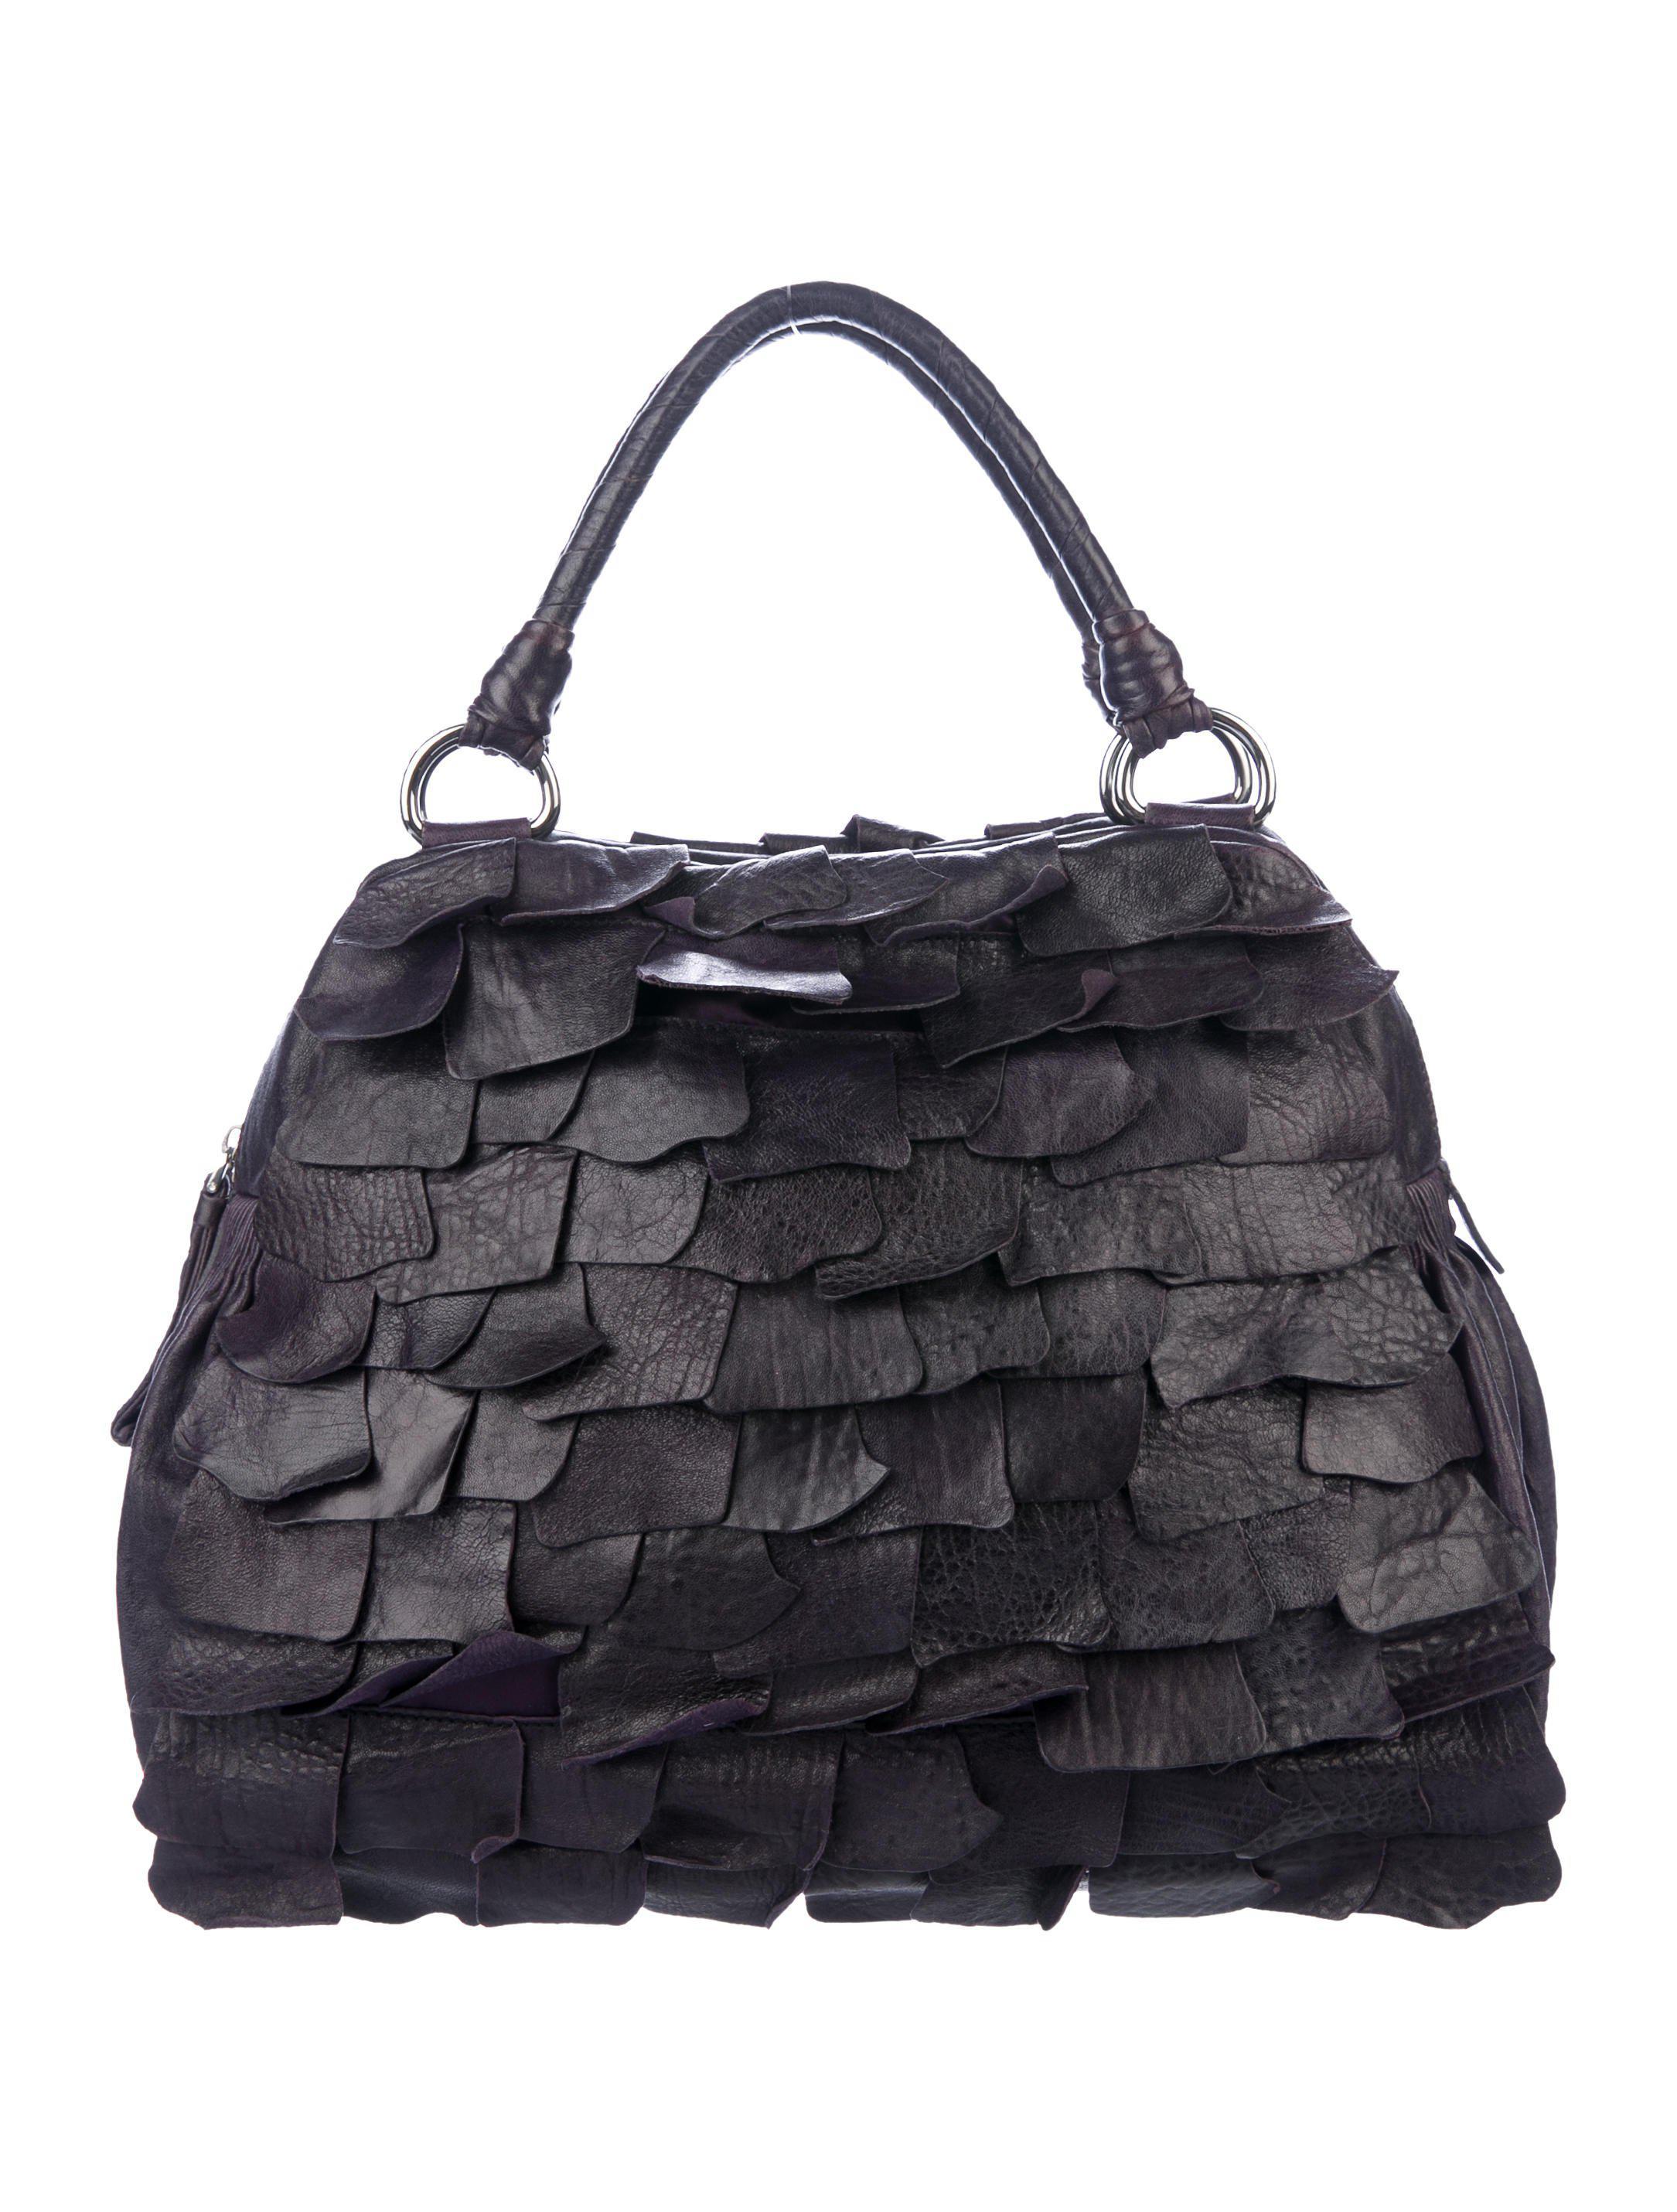 Miu Miu. Women's Metallic Miu Ruffled Leather Handle Bag Silver